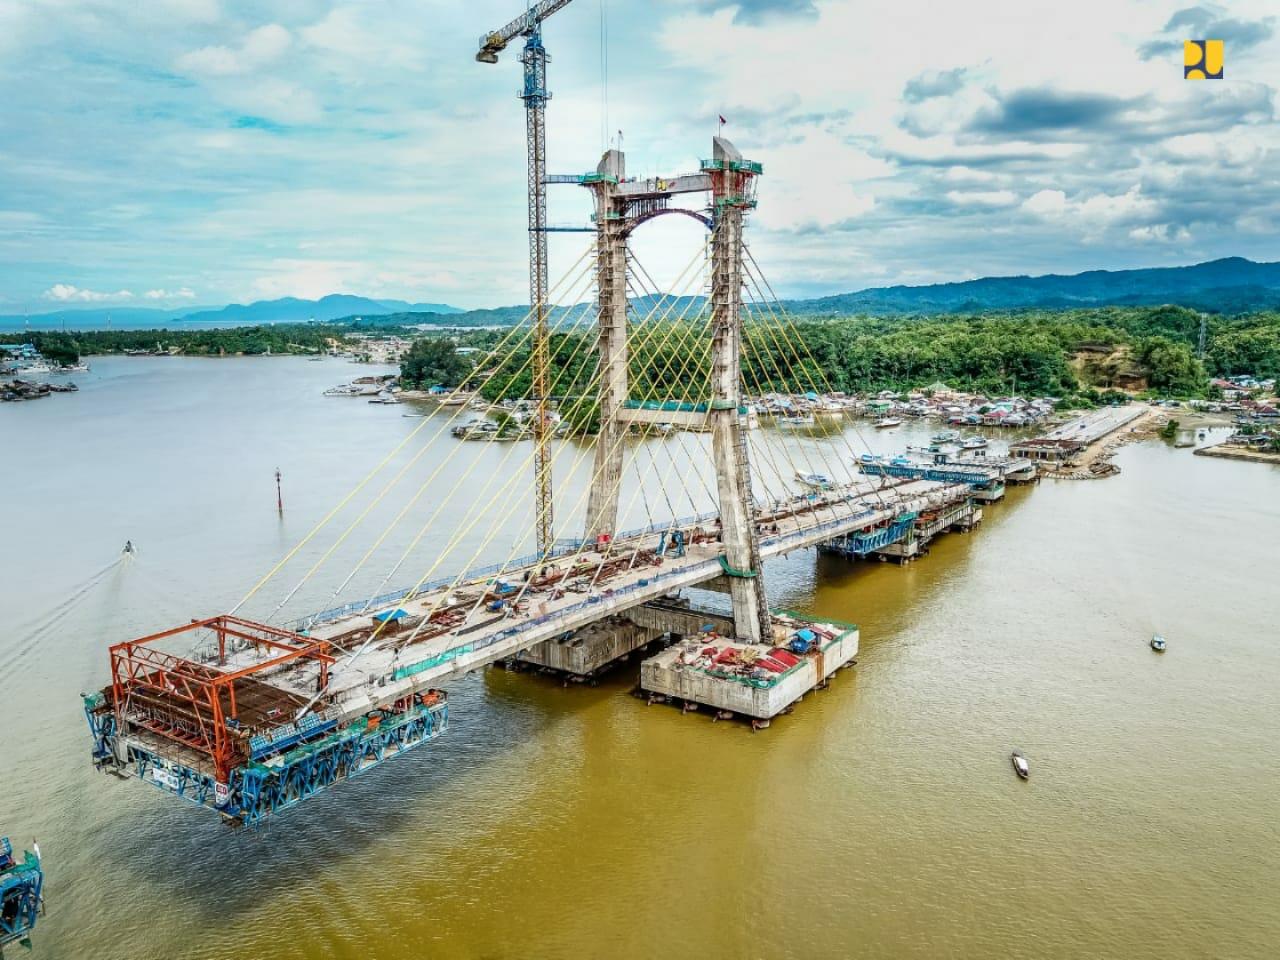 https: img-o.okeinfo.net content 2020 03 27 320 2189874 pembangunan-sudah-85-jembatan-teluk-kendari-jadi-penghubung-ke-new-port-bungkutoko-pYf23oFZdL.jpeg